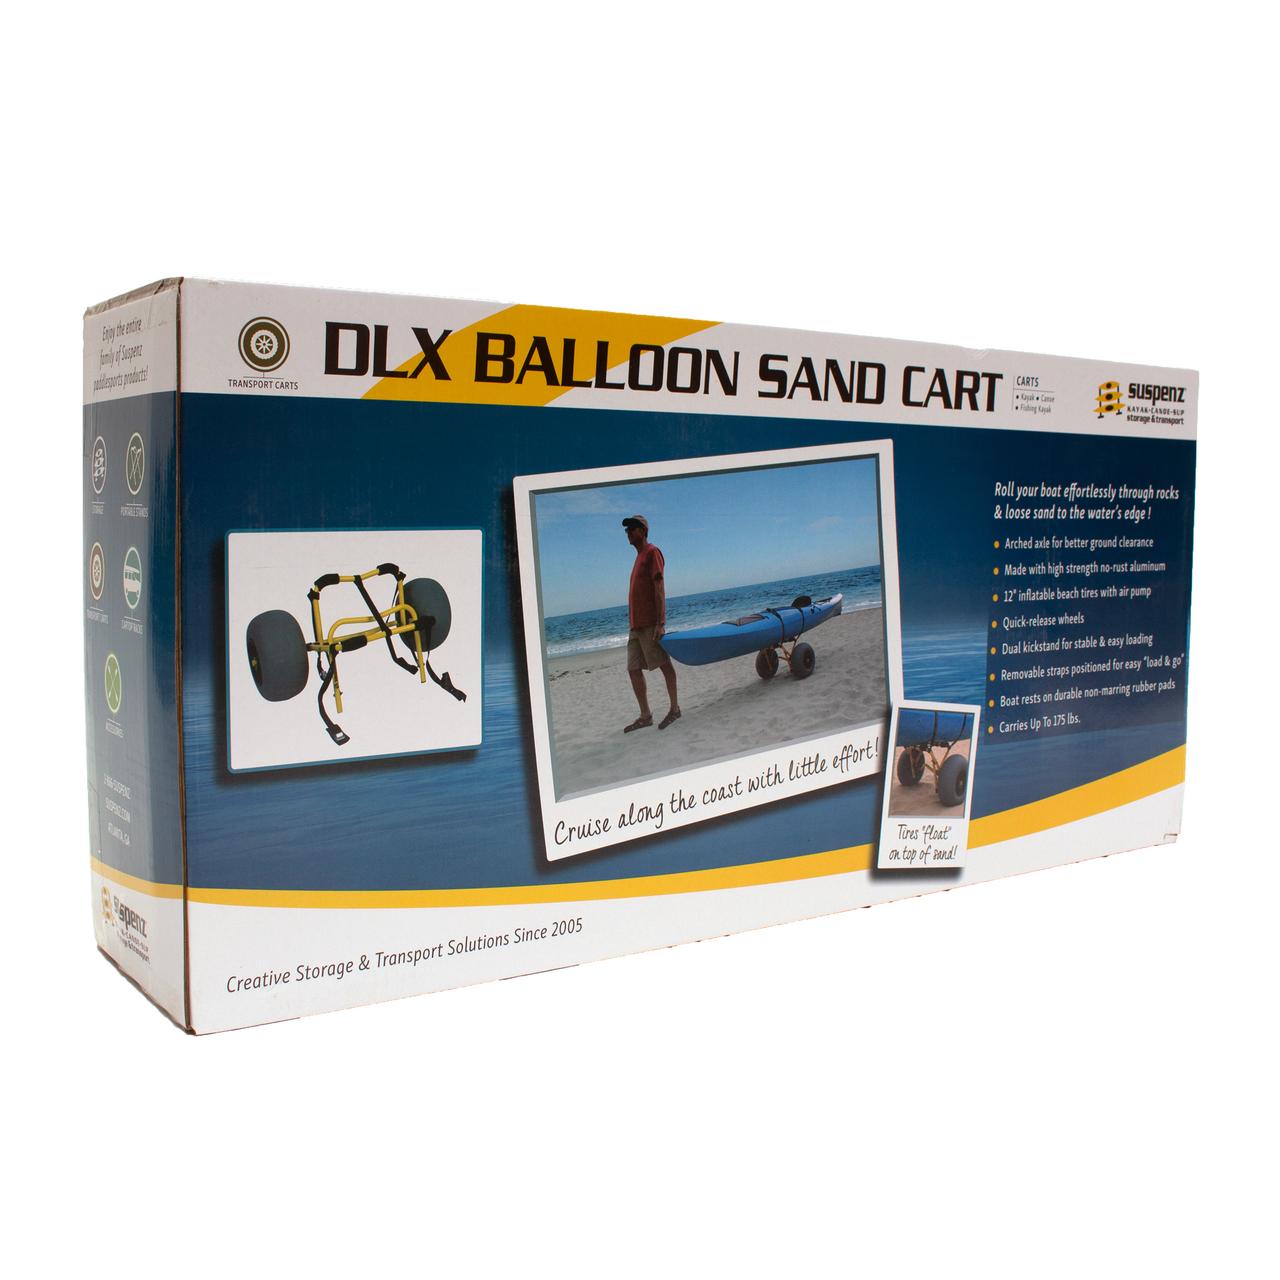 DLX Beach Cart (Mid-V™ & Flat Platform)